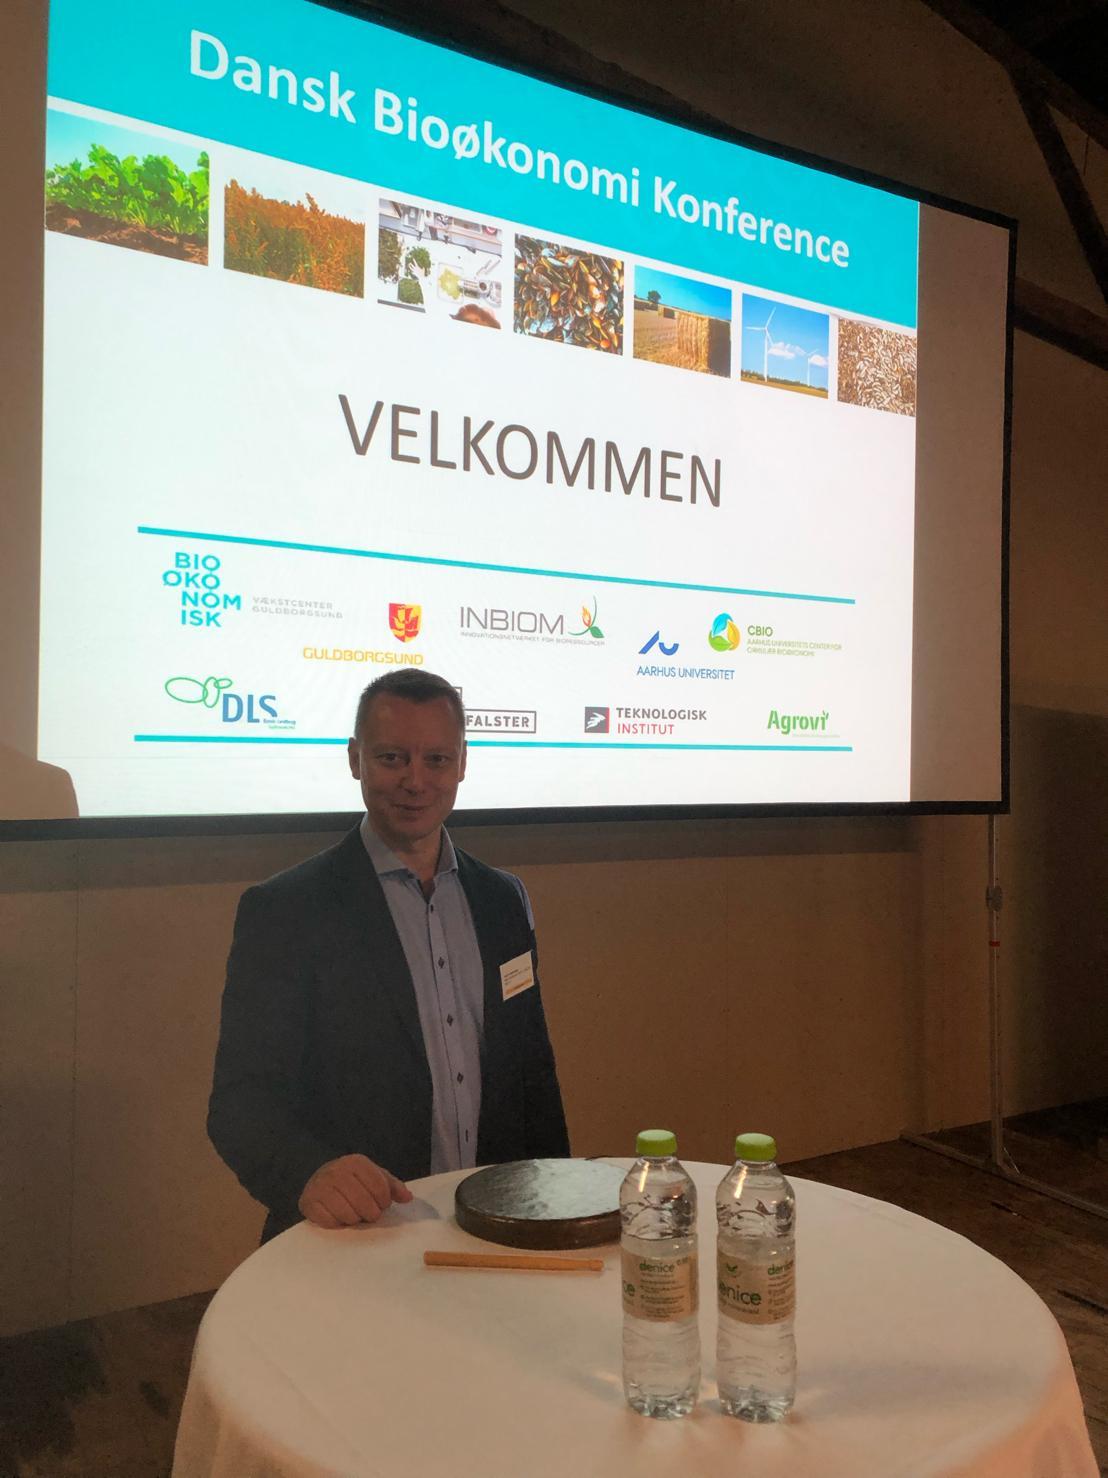 Valuewaste Dansk Bioøkonomi Konference 2019